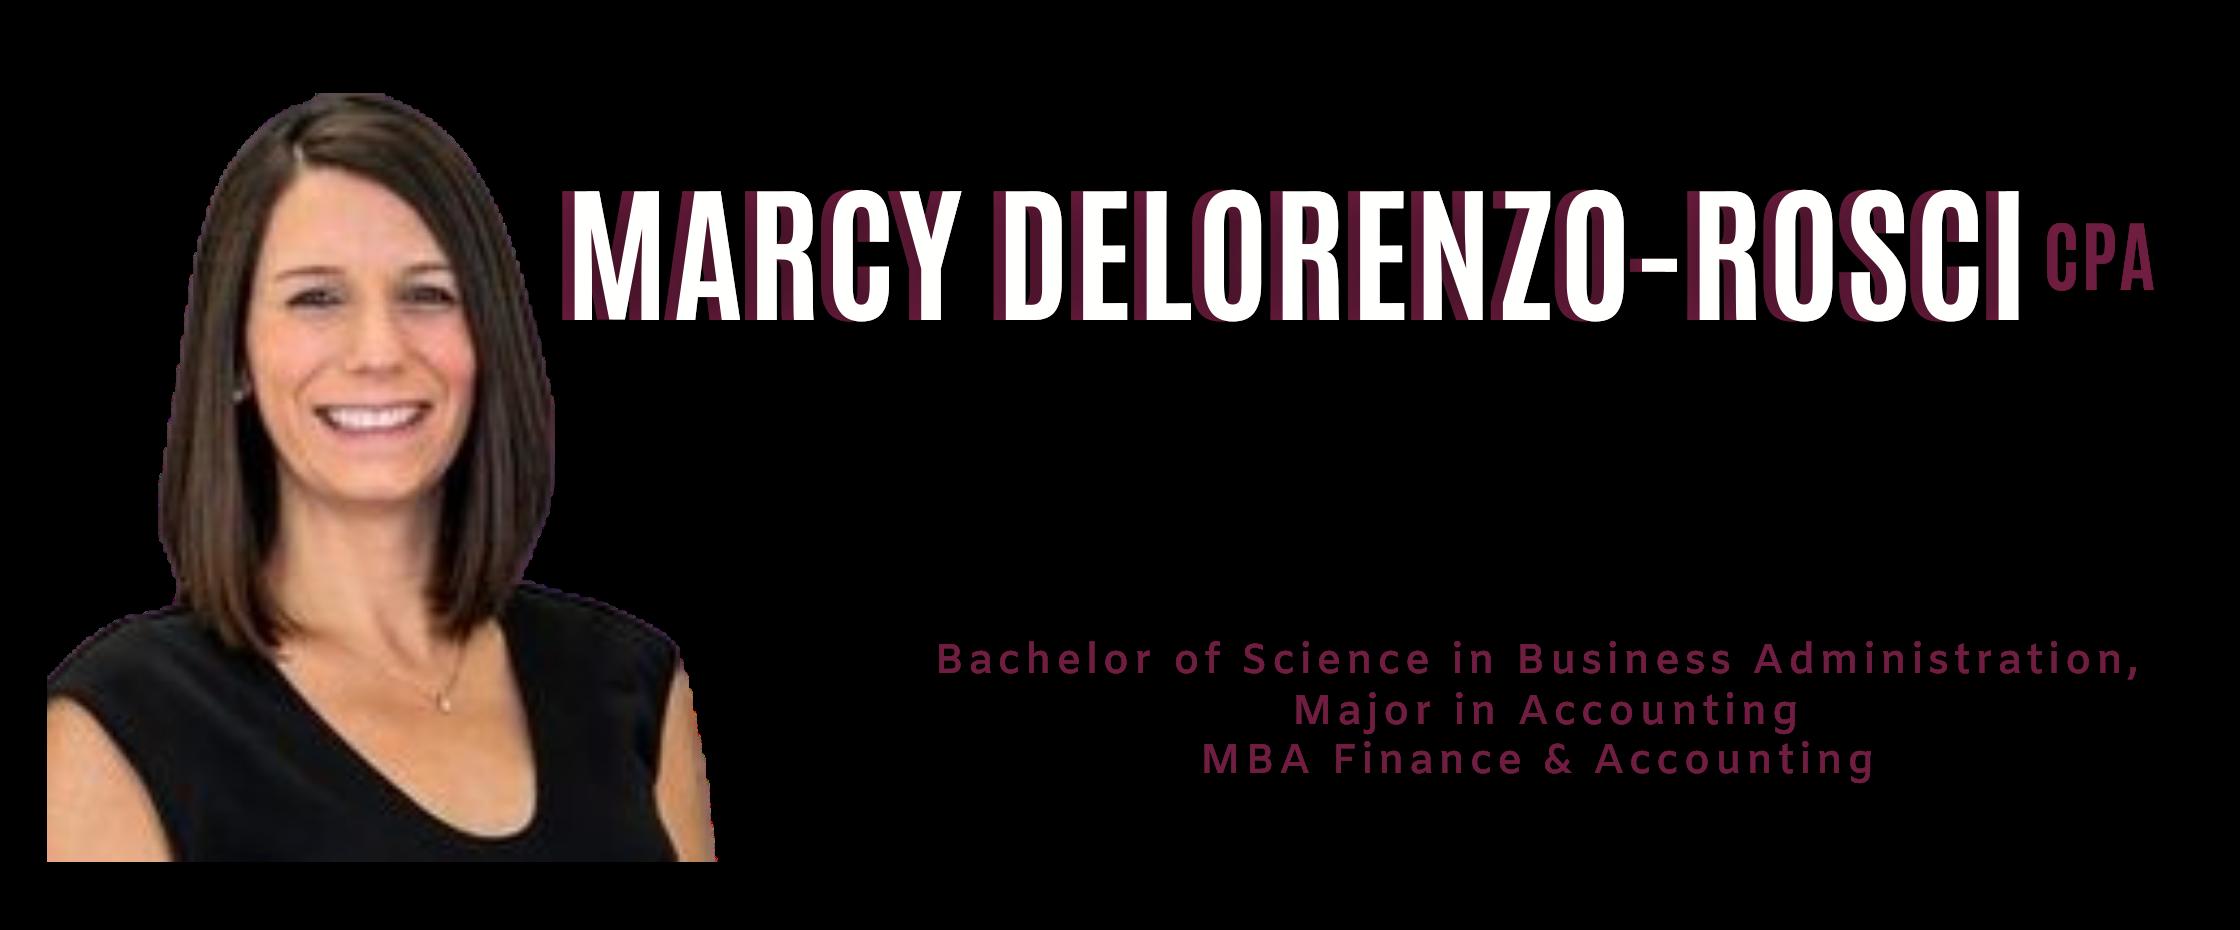 Marcy DeLorenzo-Rosci